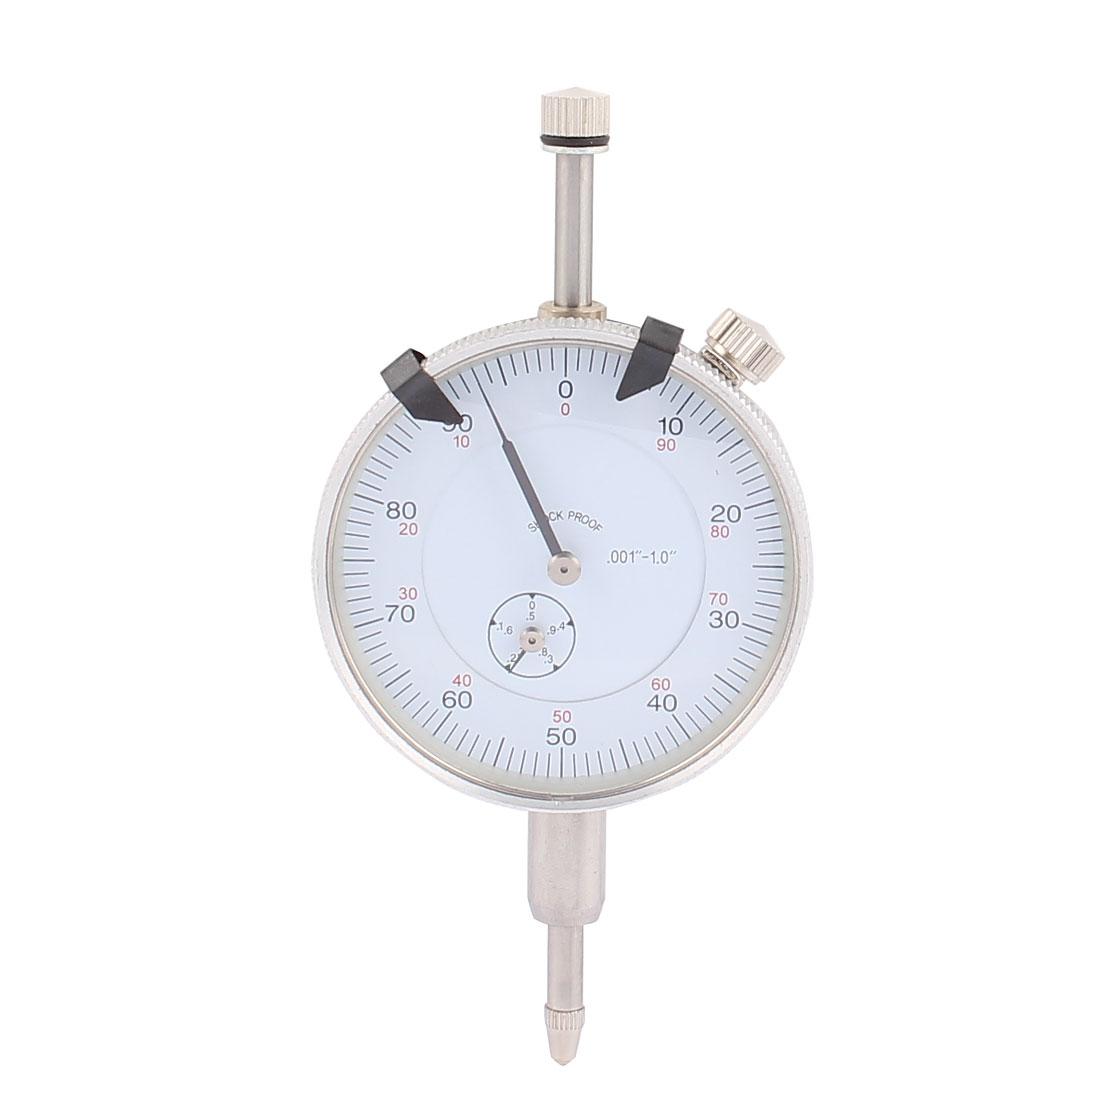 0-1inch Range Measurement Instrument Dial Indicator Gauge Precision Tool B-06